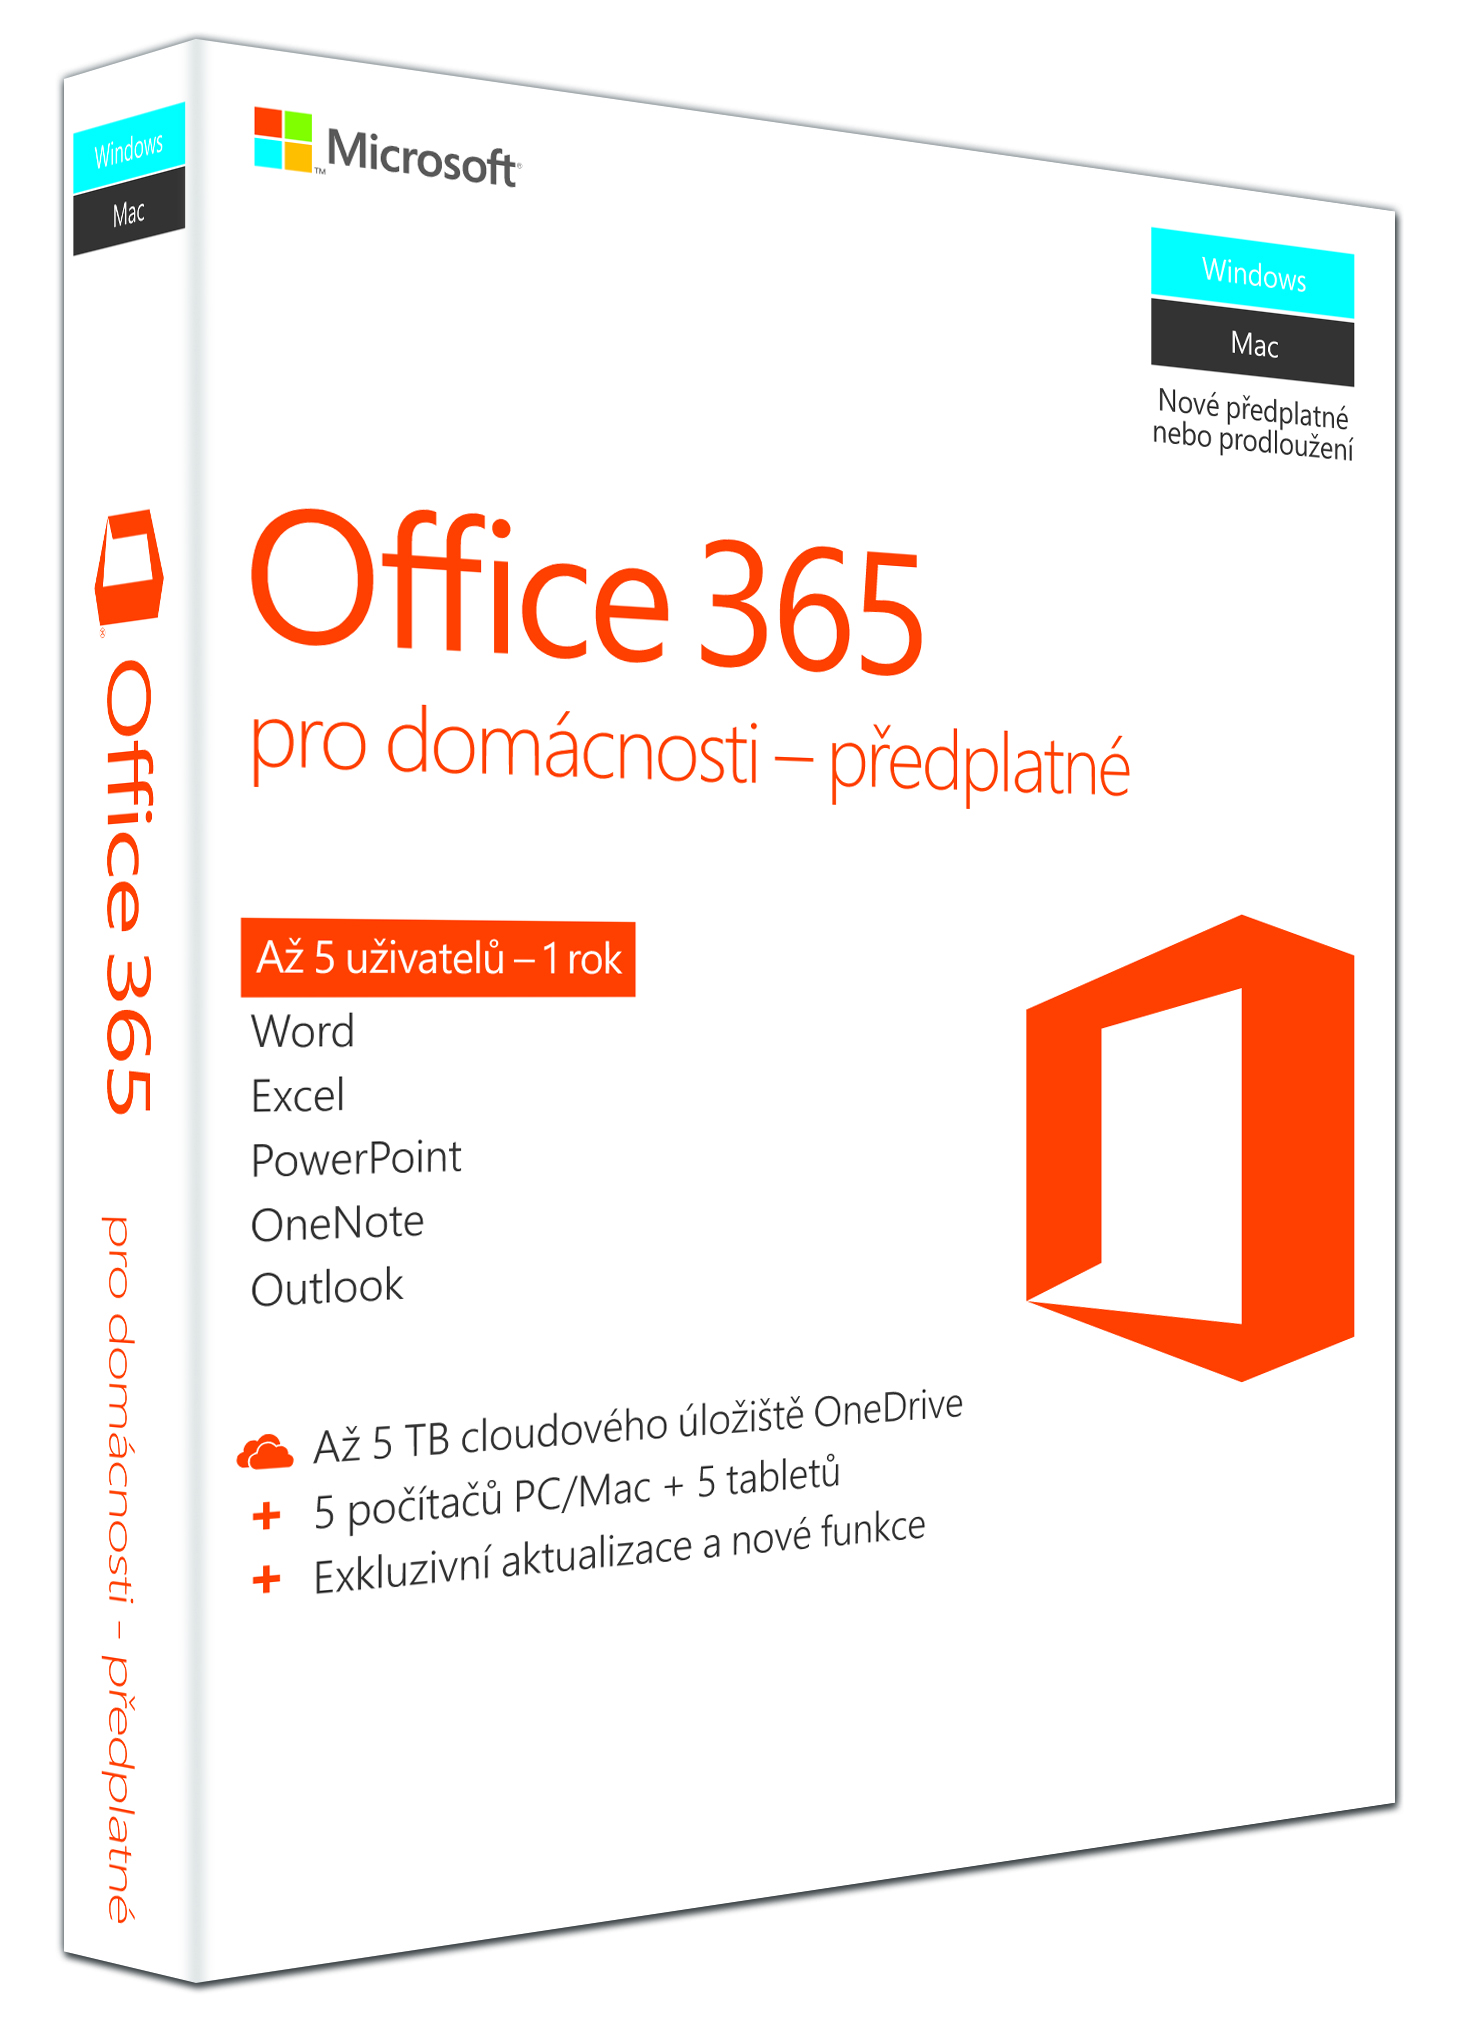 Office 365 Home 32-bit/x64 CZ pronájem, P2